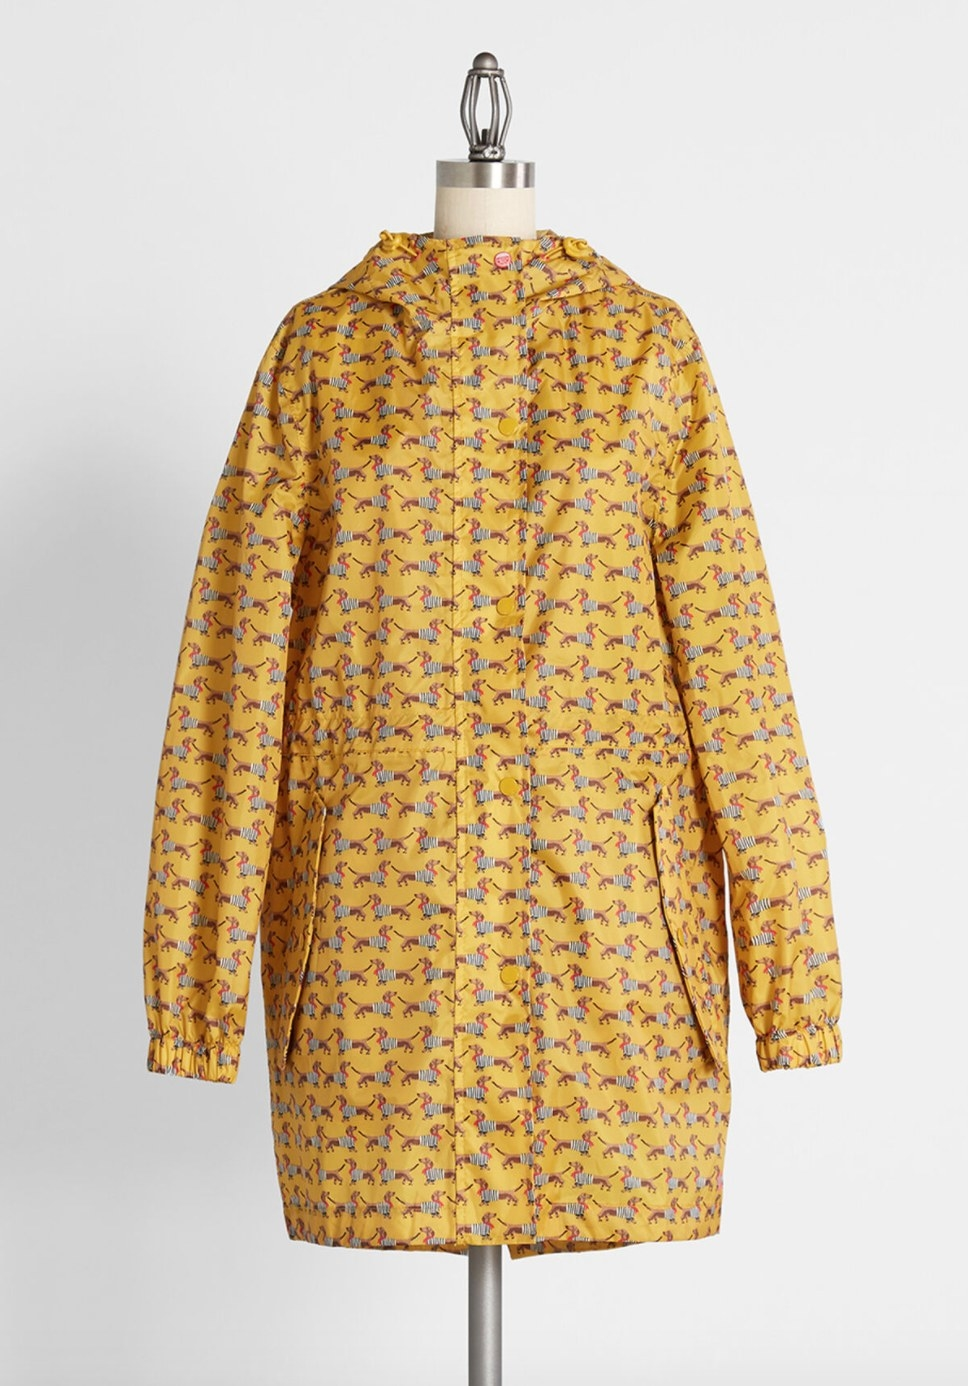 The dachshund dog printed yellow rain jacket